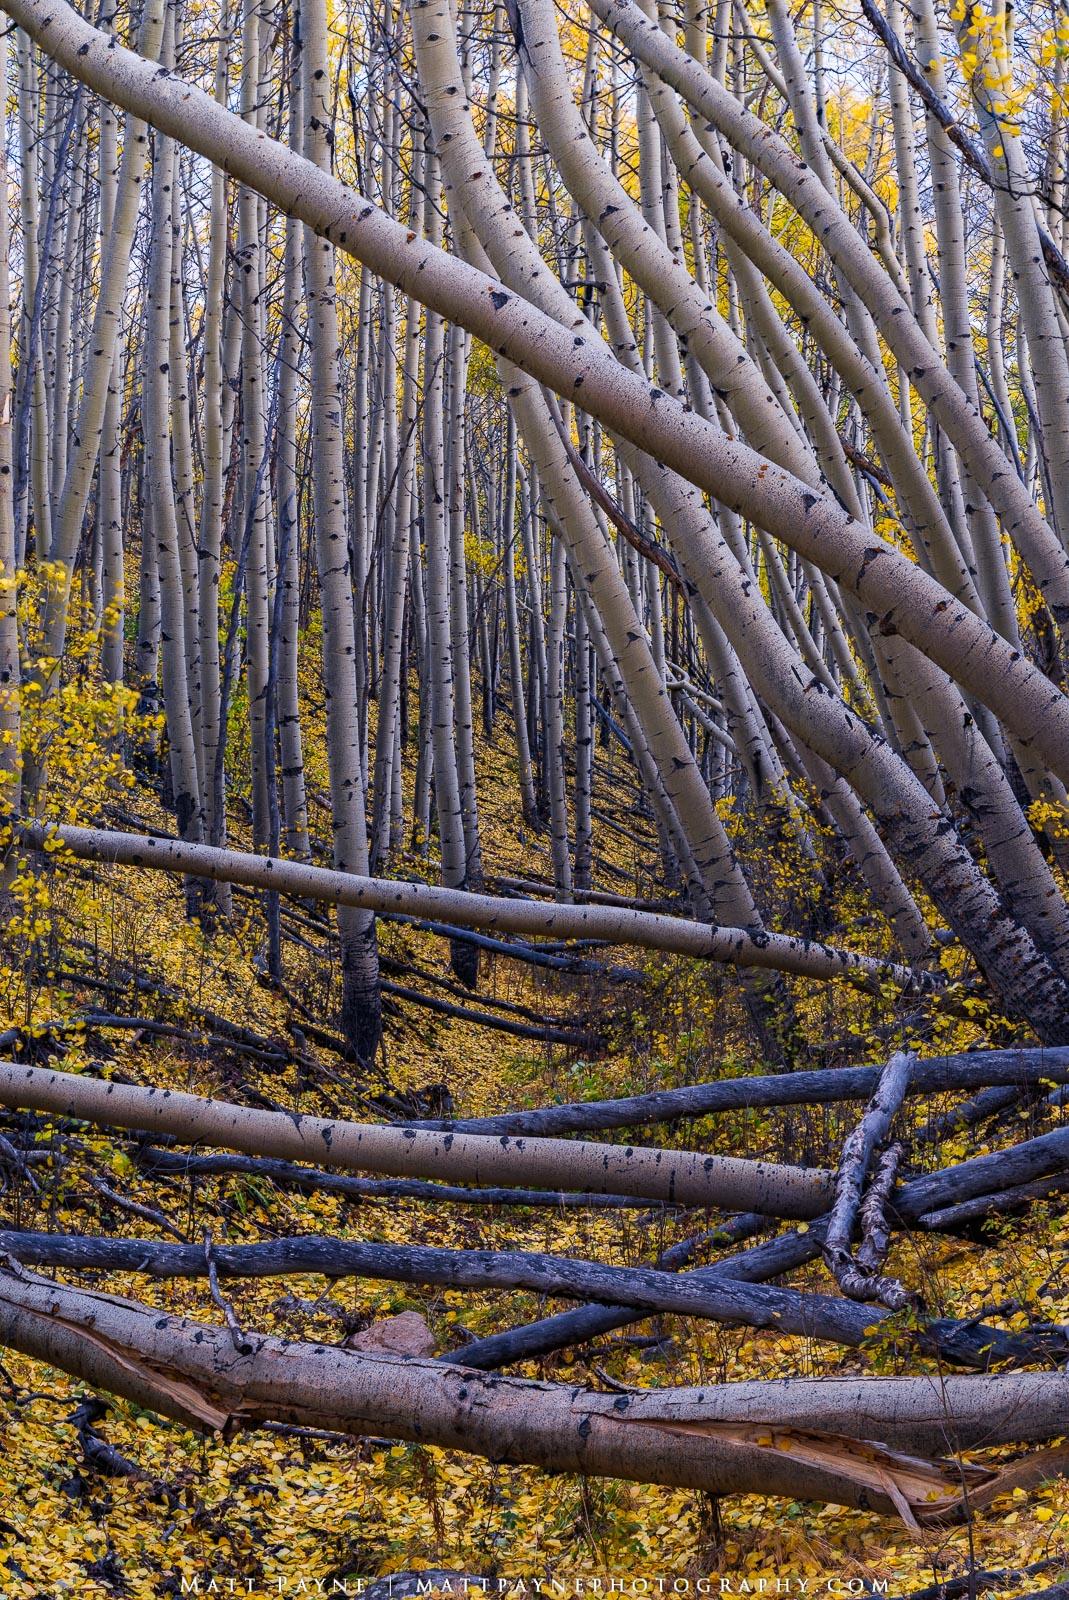 Aspen Trees, Autumn, Colorado, Fall, Fall Colors, Foliage, Forest, Landscape, aspen leaves, landscape photography, photo